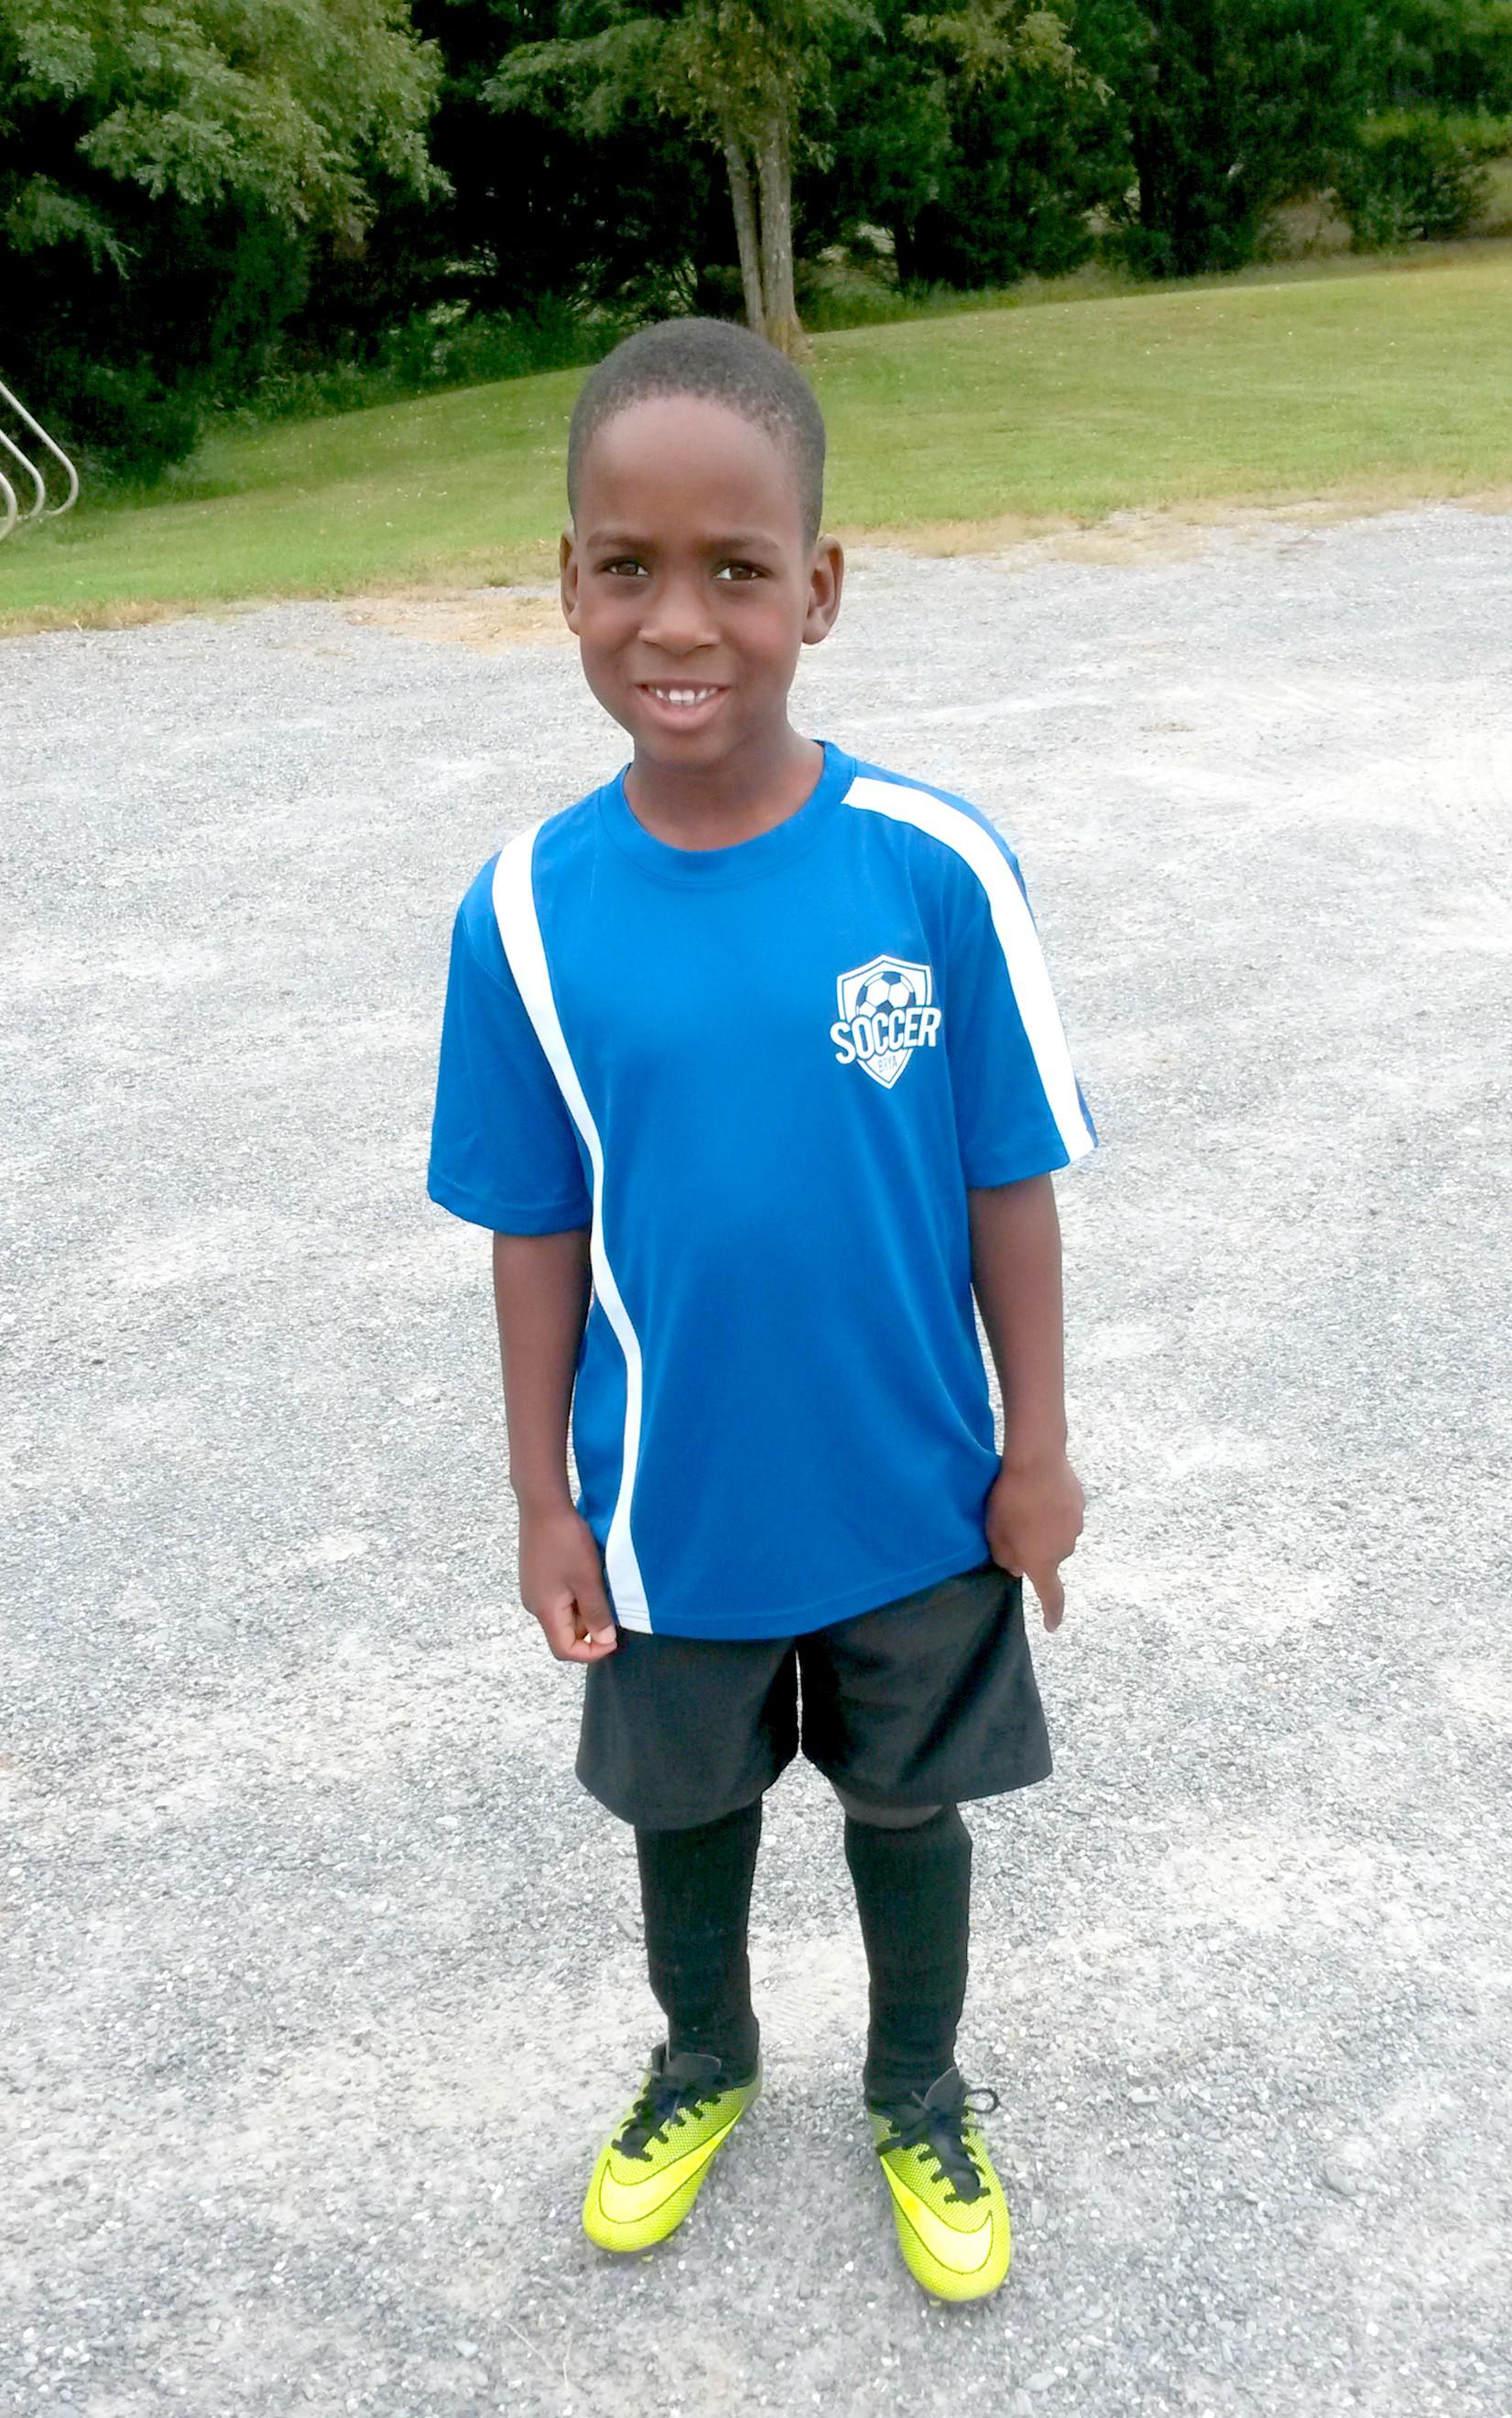 The soccer super star!